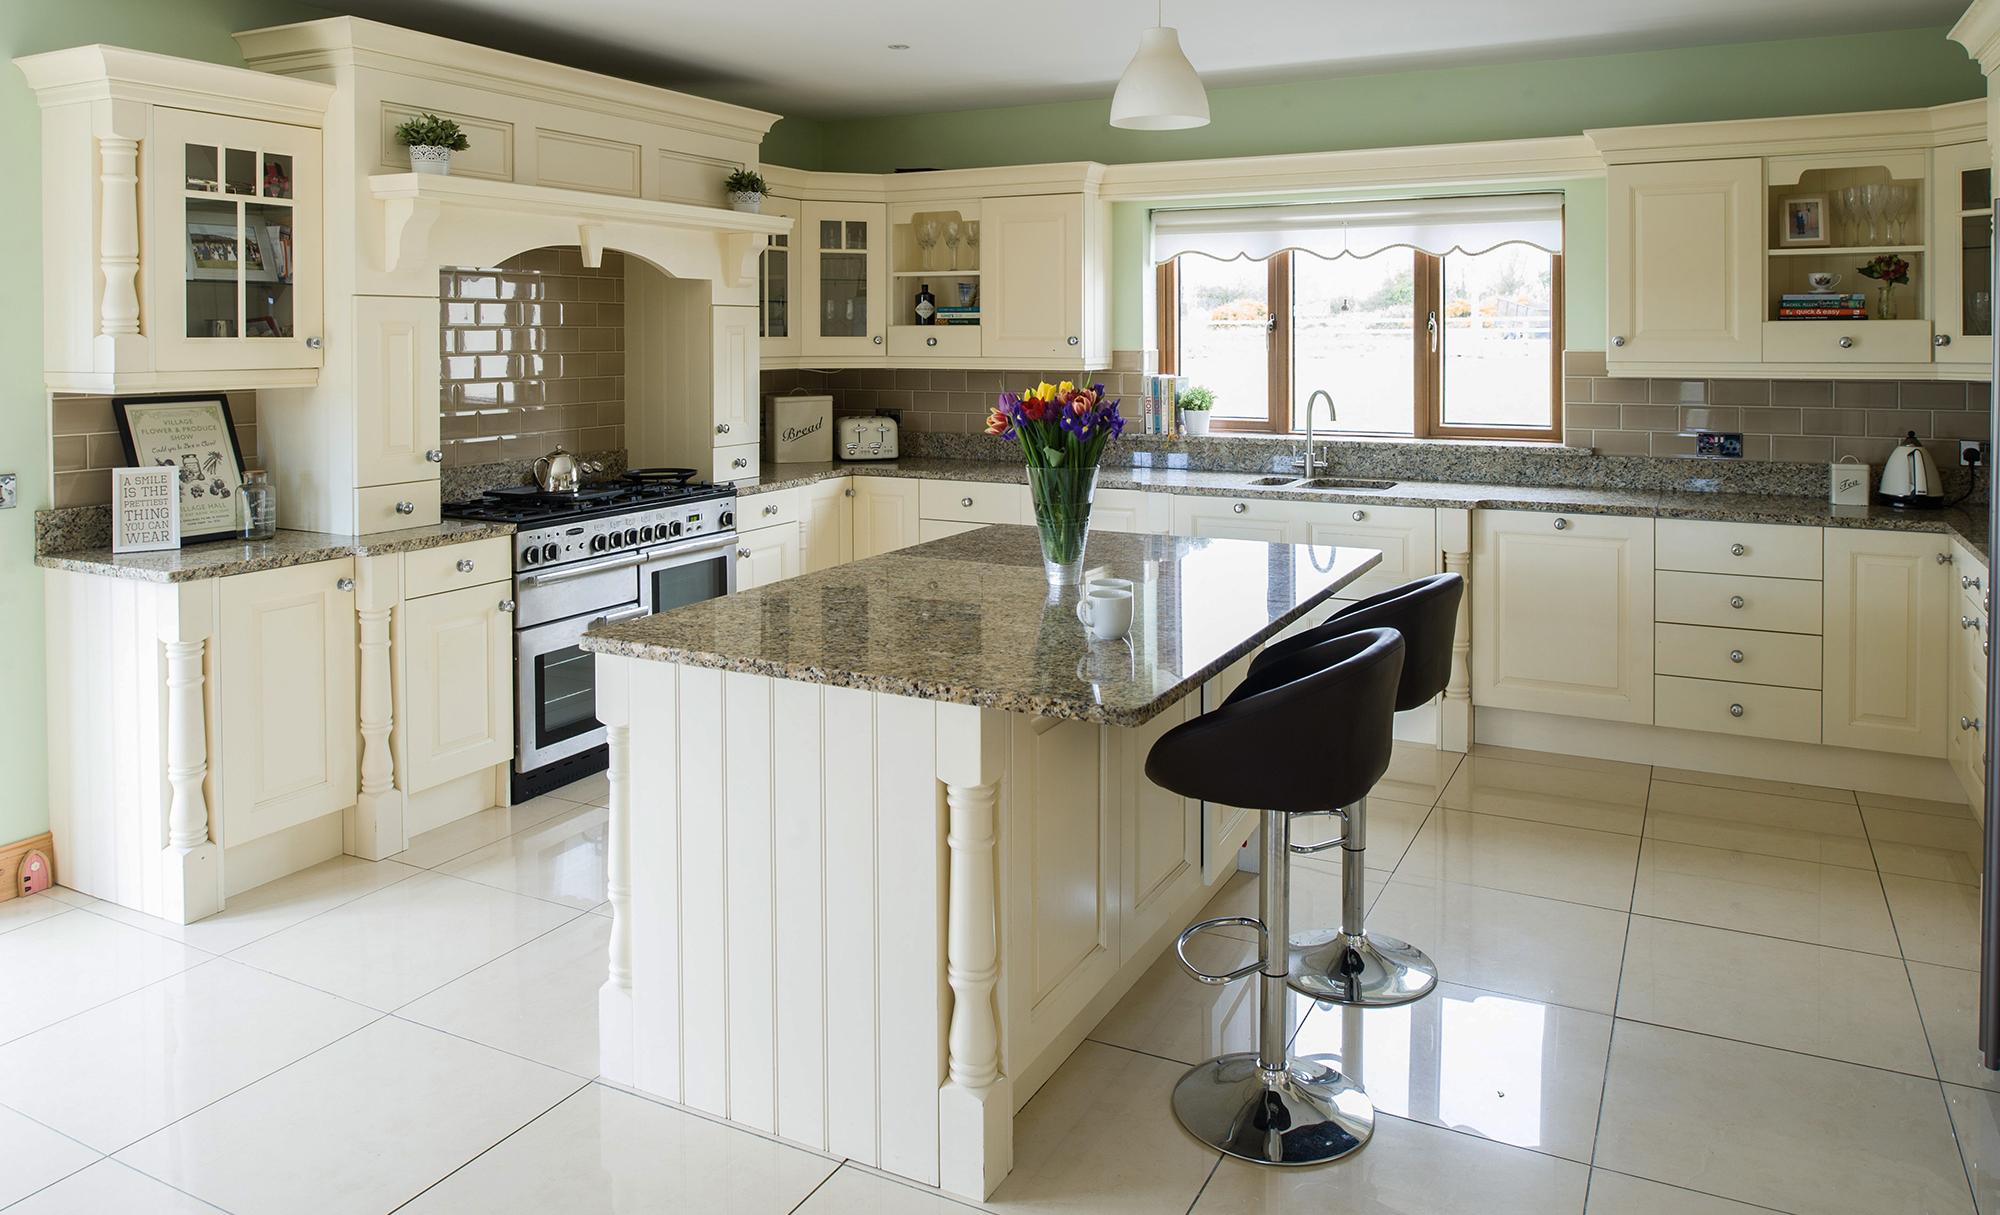 Kitchen Stori Dante Kitchen in Painted Ivory, Harpur House, Co.Dublin